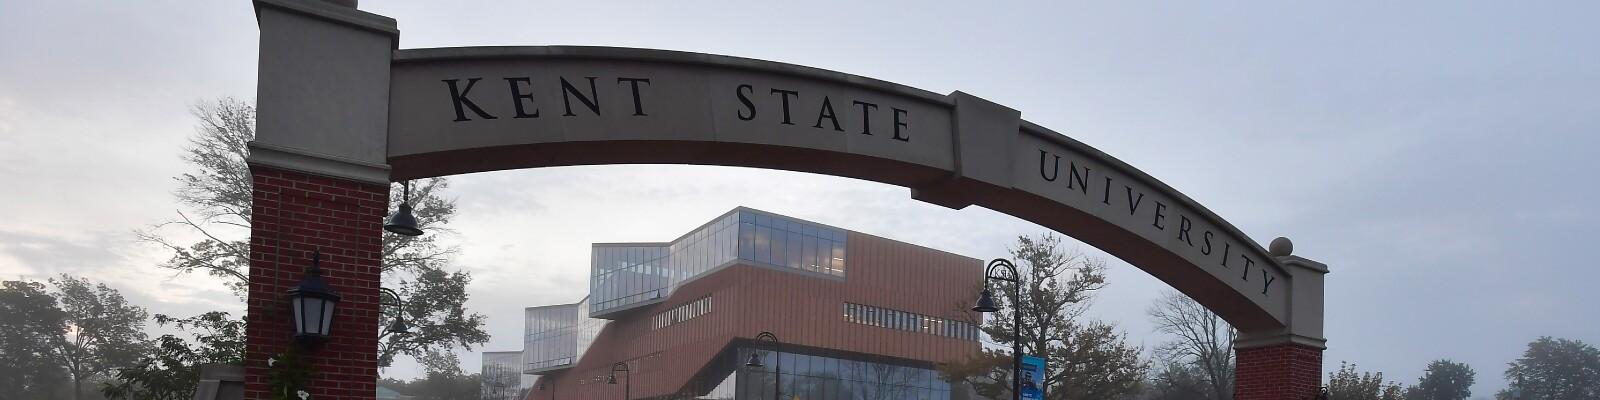 Kent State University archway